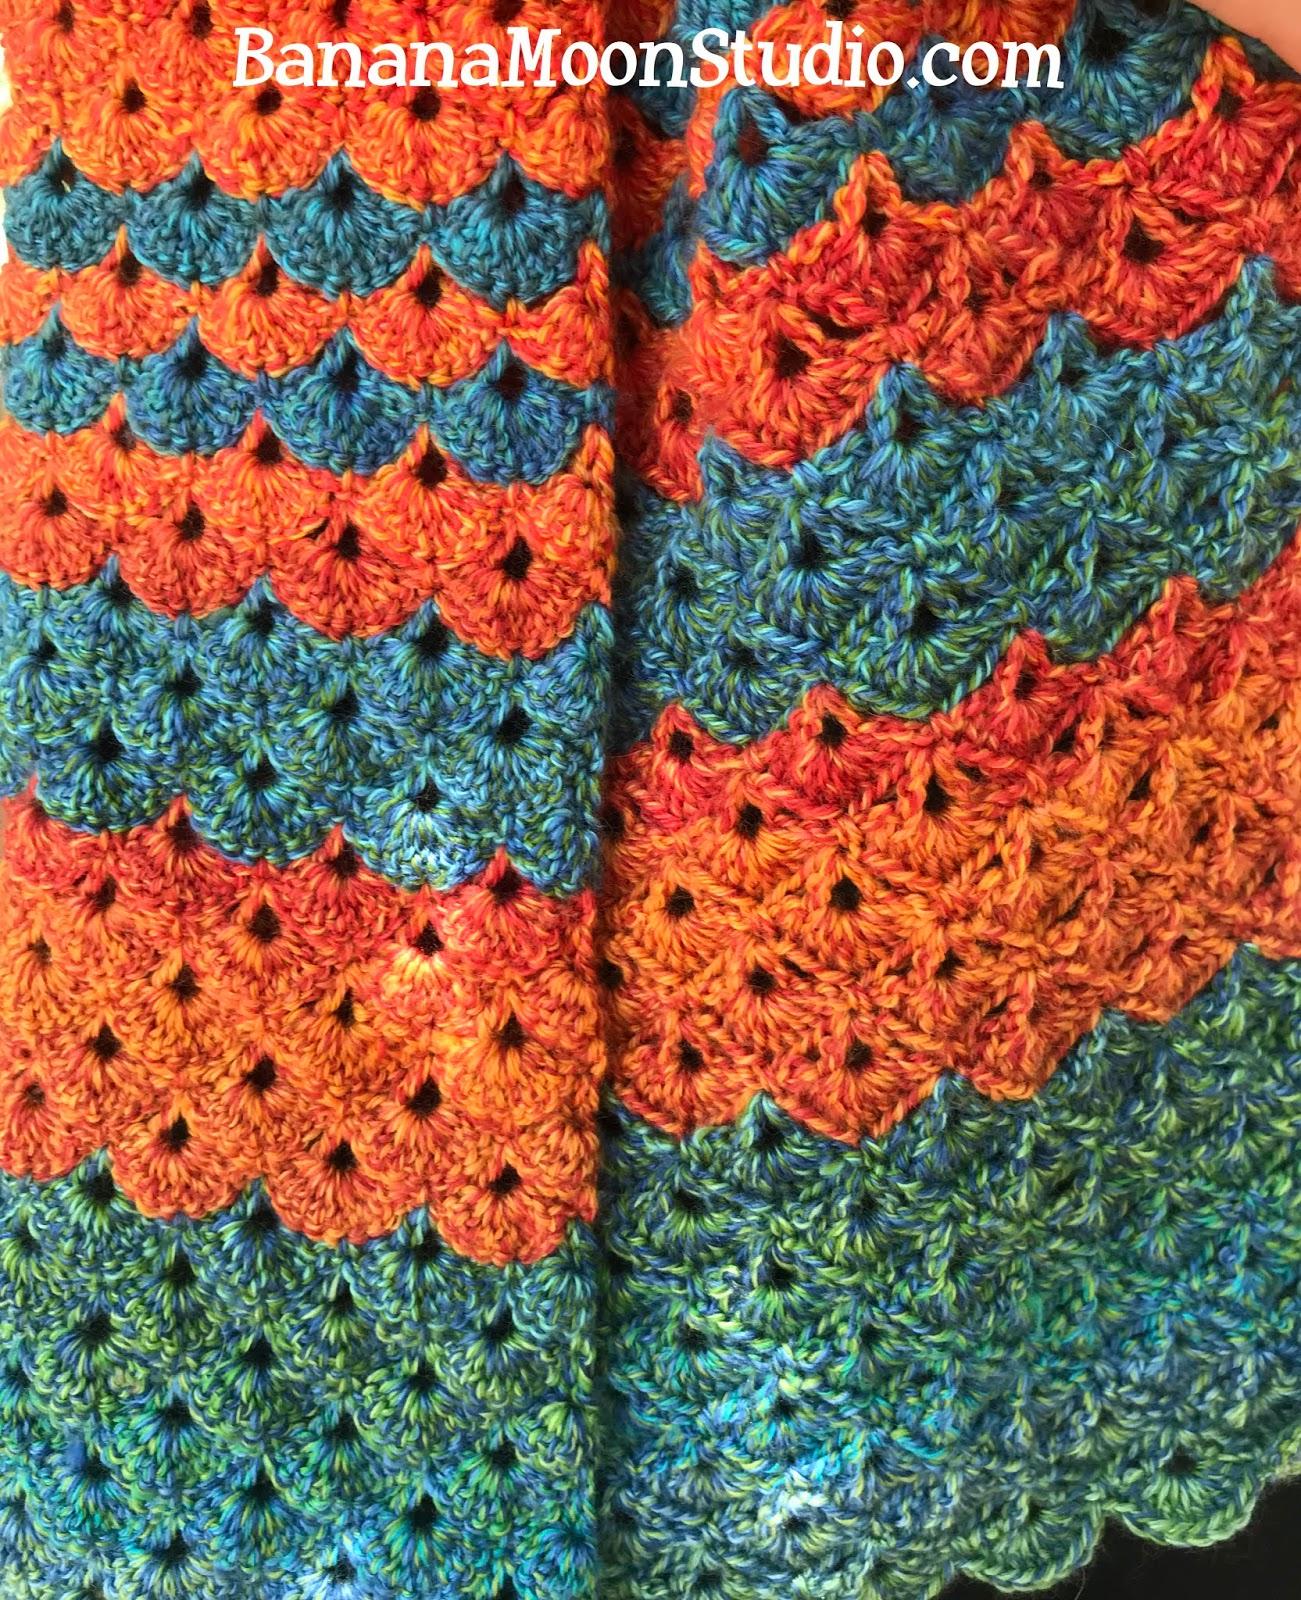 Crochet wrap pattern, free from Banana Moon Studio!